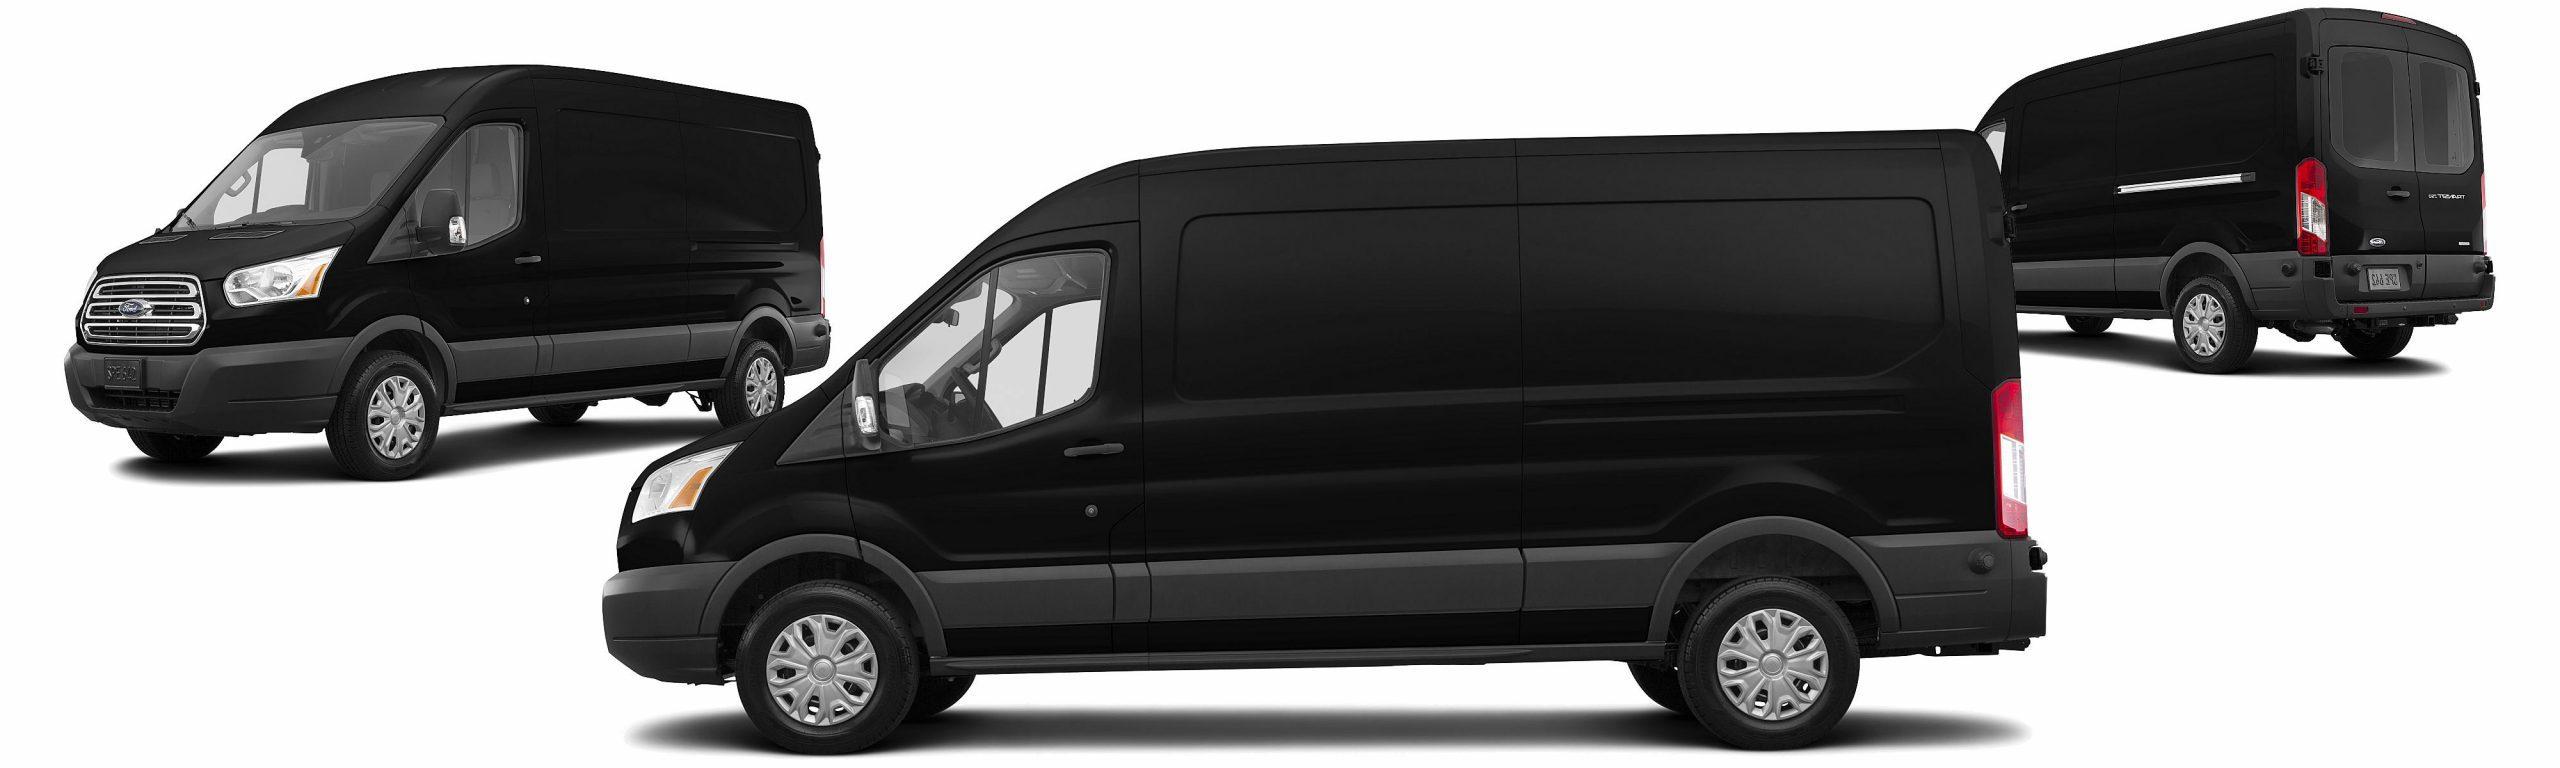 2017-ford-transit-cargo